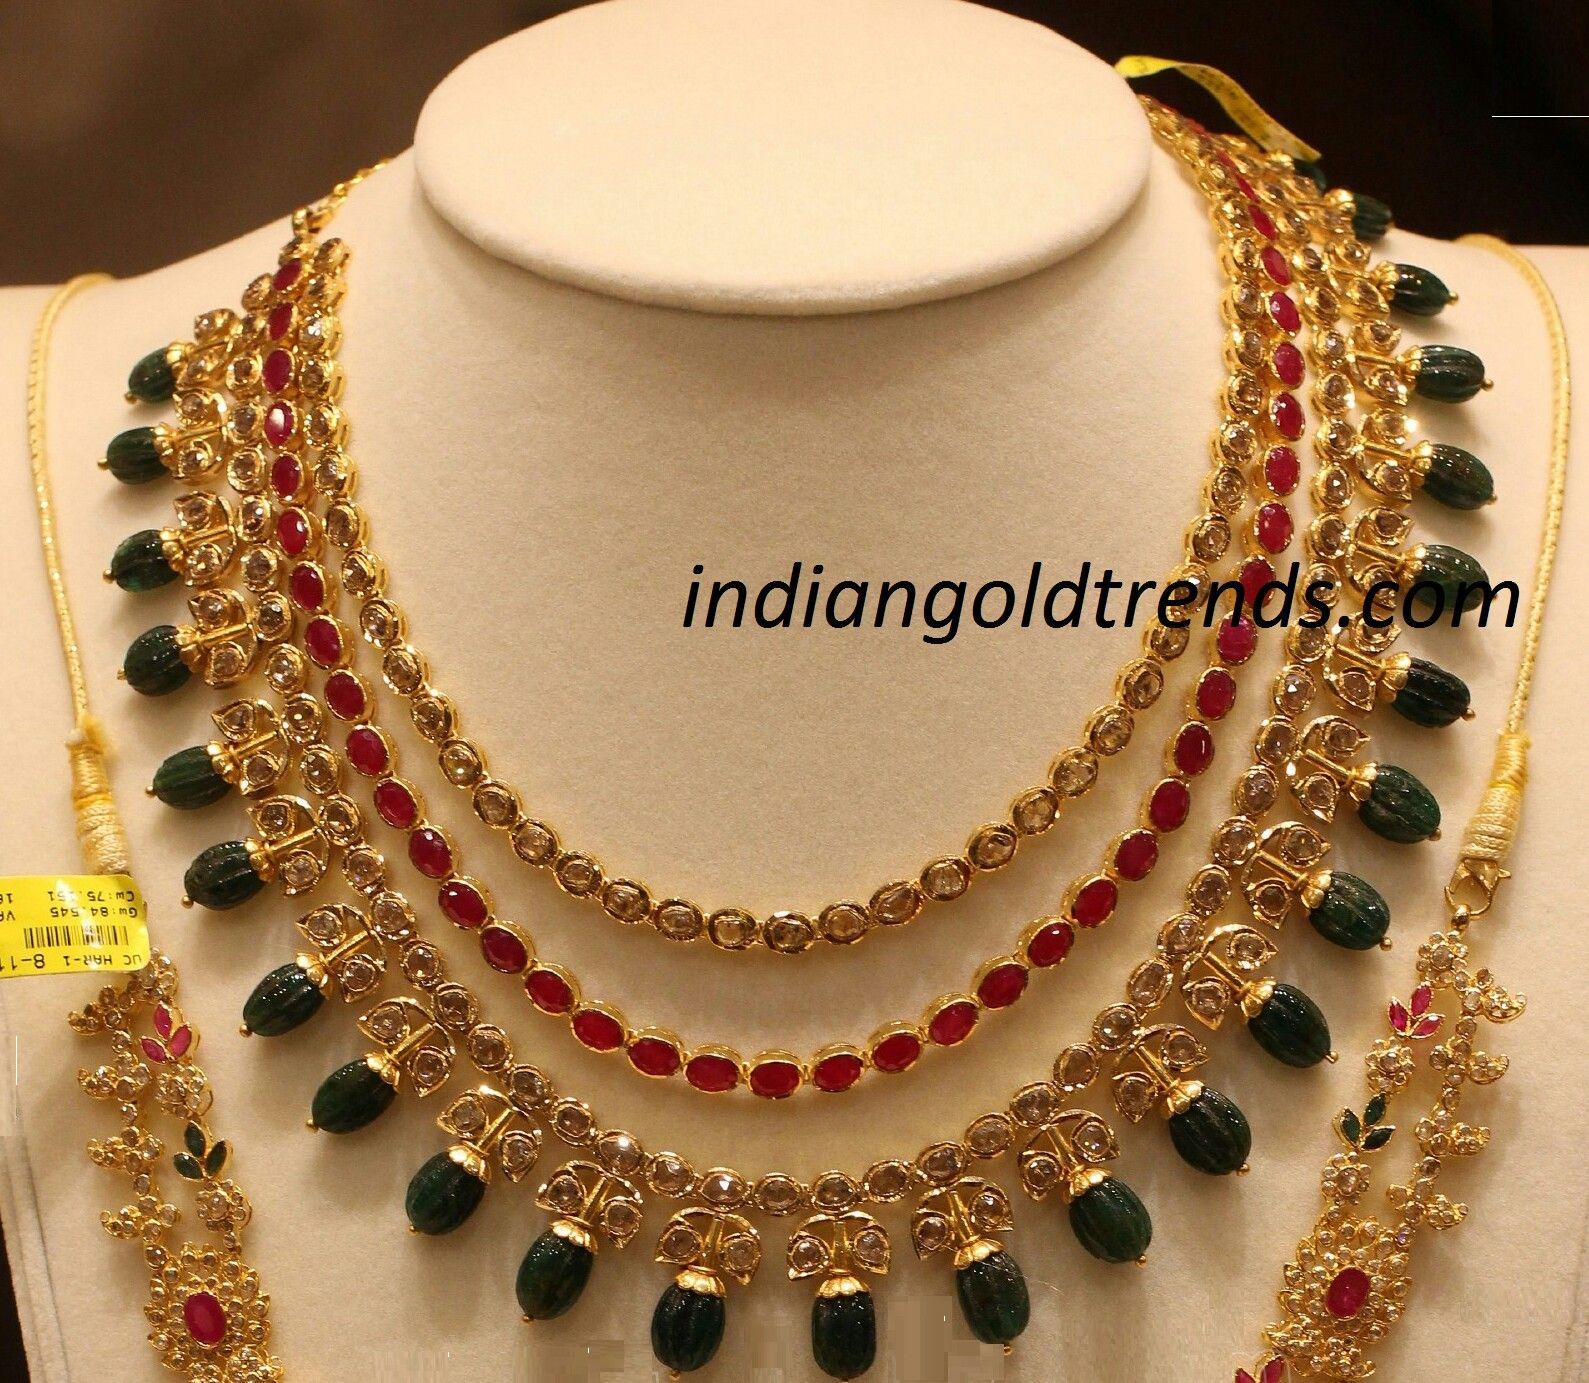 Saree jewellery images pin by anushree on sarees u jewellery  pinterest  discover more